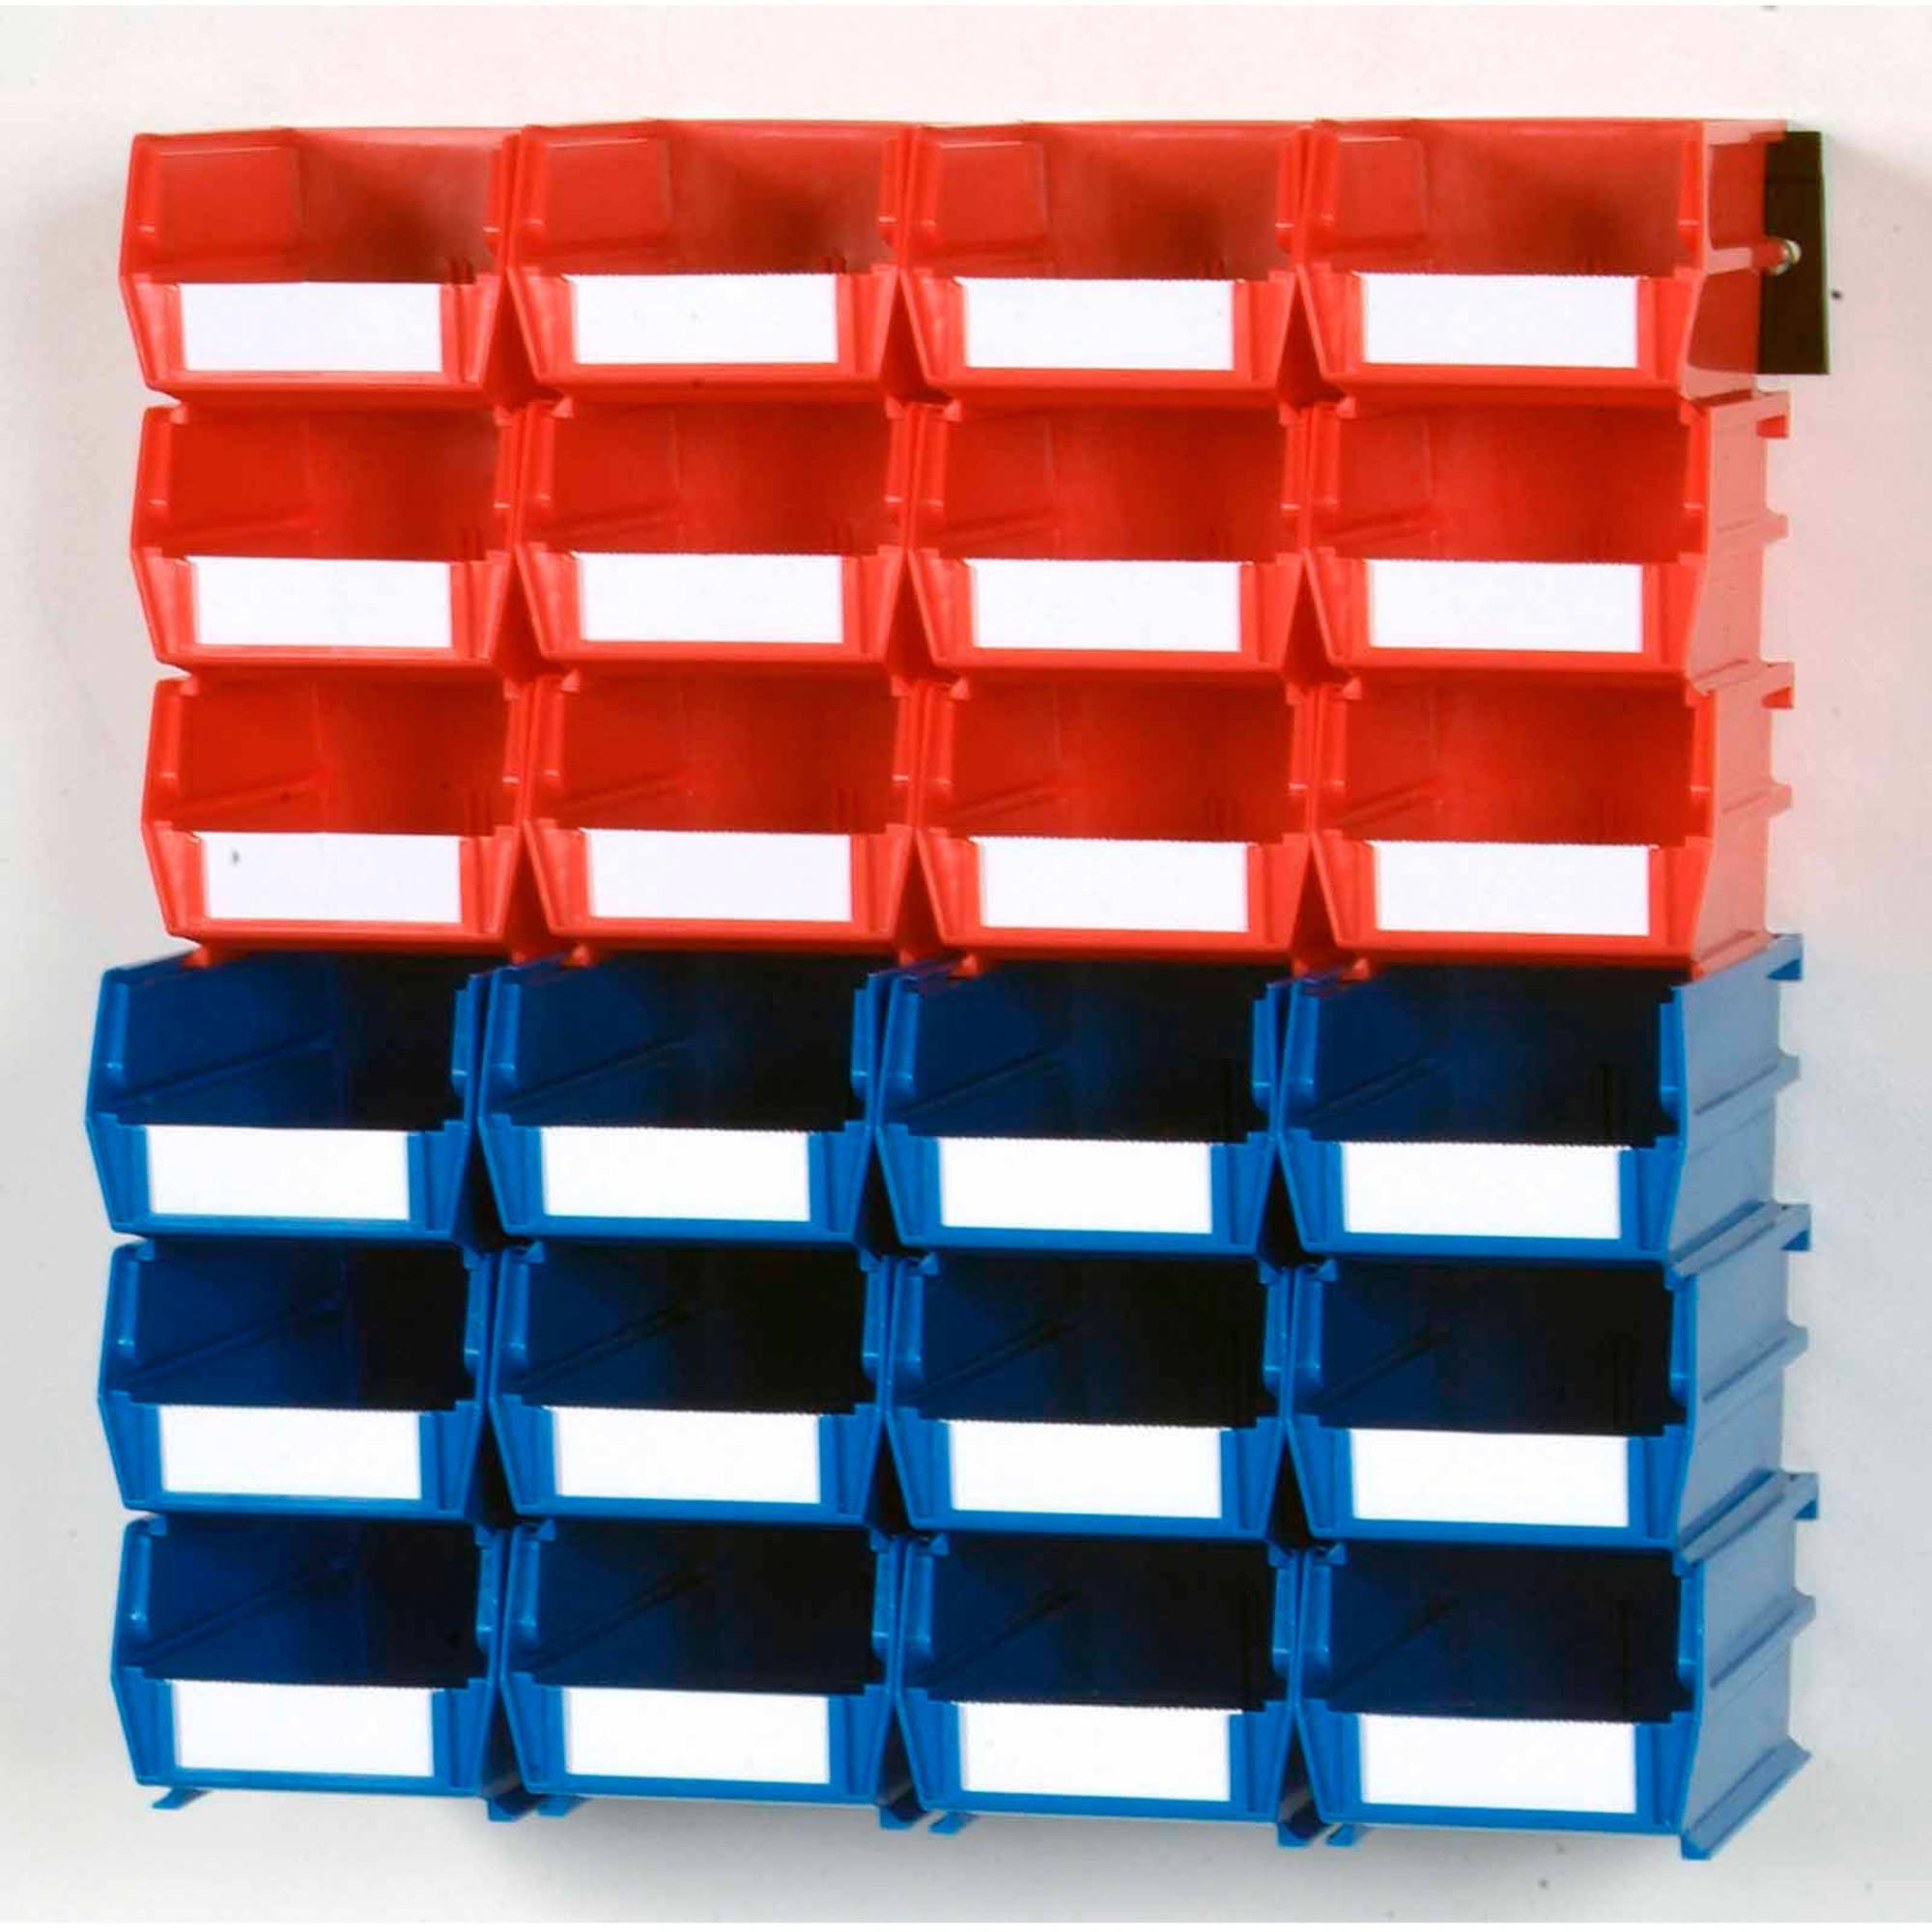 Triton Products Locbin 26 Piece Wall Storage Unit With 12 5 3 8 L X 4 1 8 W X 3 H Red Bins 12 7 3 8 L X 4 1 8 W X 3 H Blue Bins 24ct Wall Mount Rails 8 3 4 L With Hardware